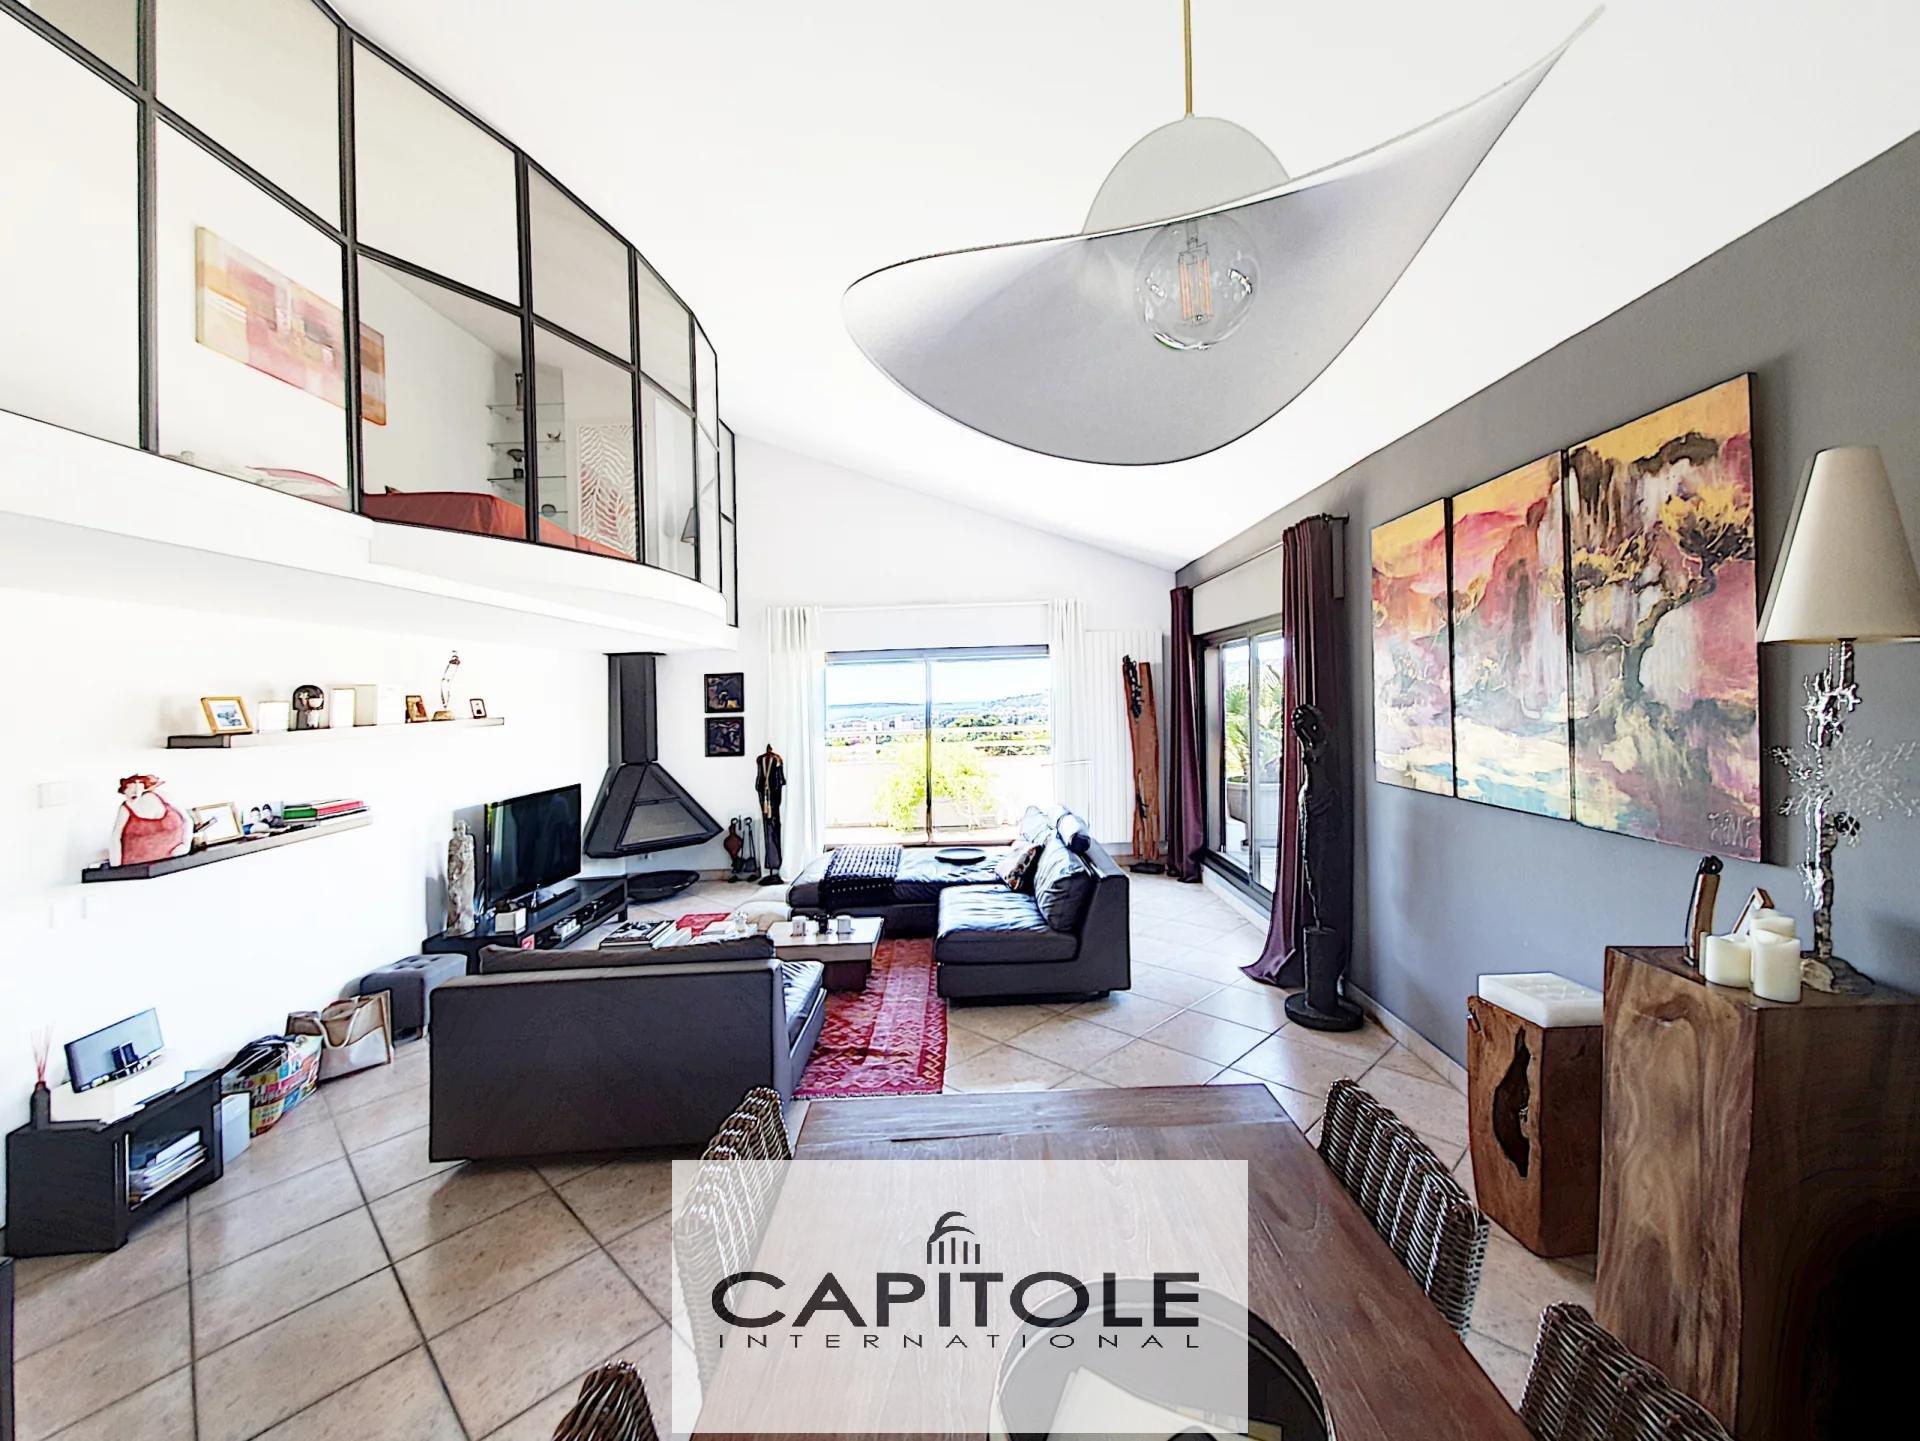 For sale, Antibes top floor sea view apartment 117 sqm,  spacious terrace, garage, cellar